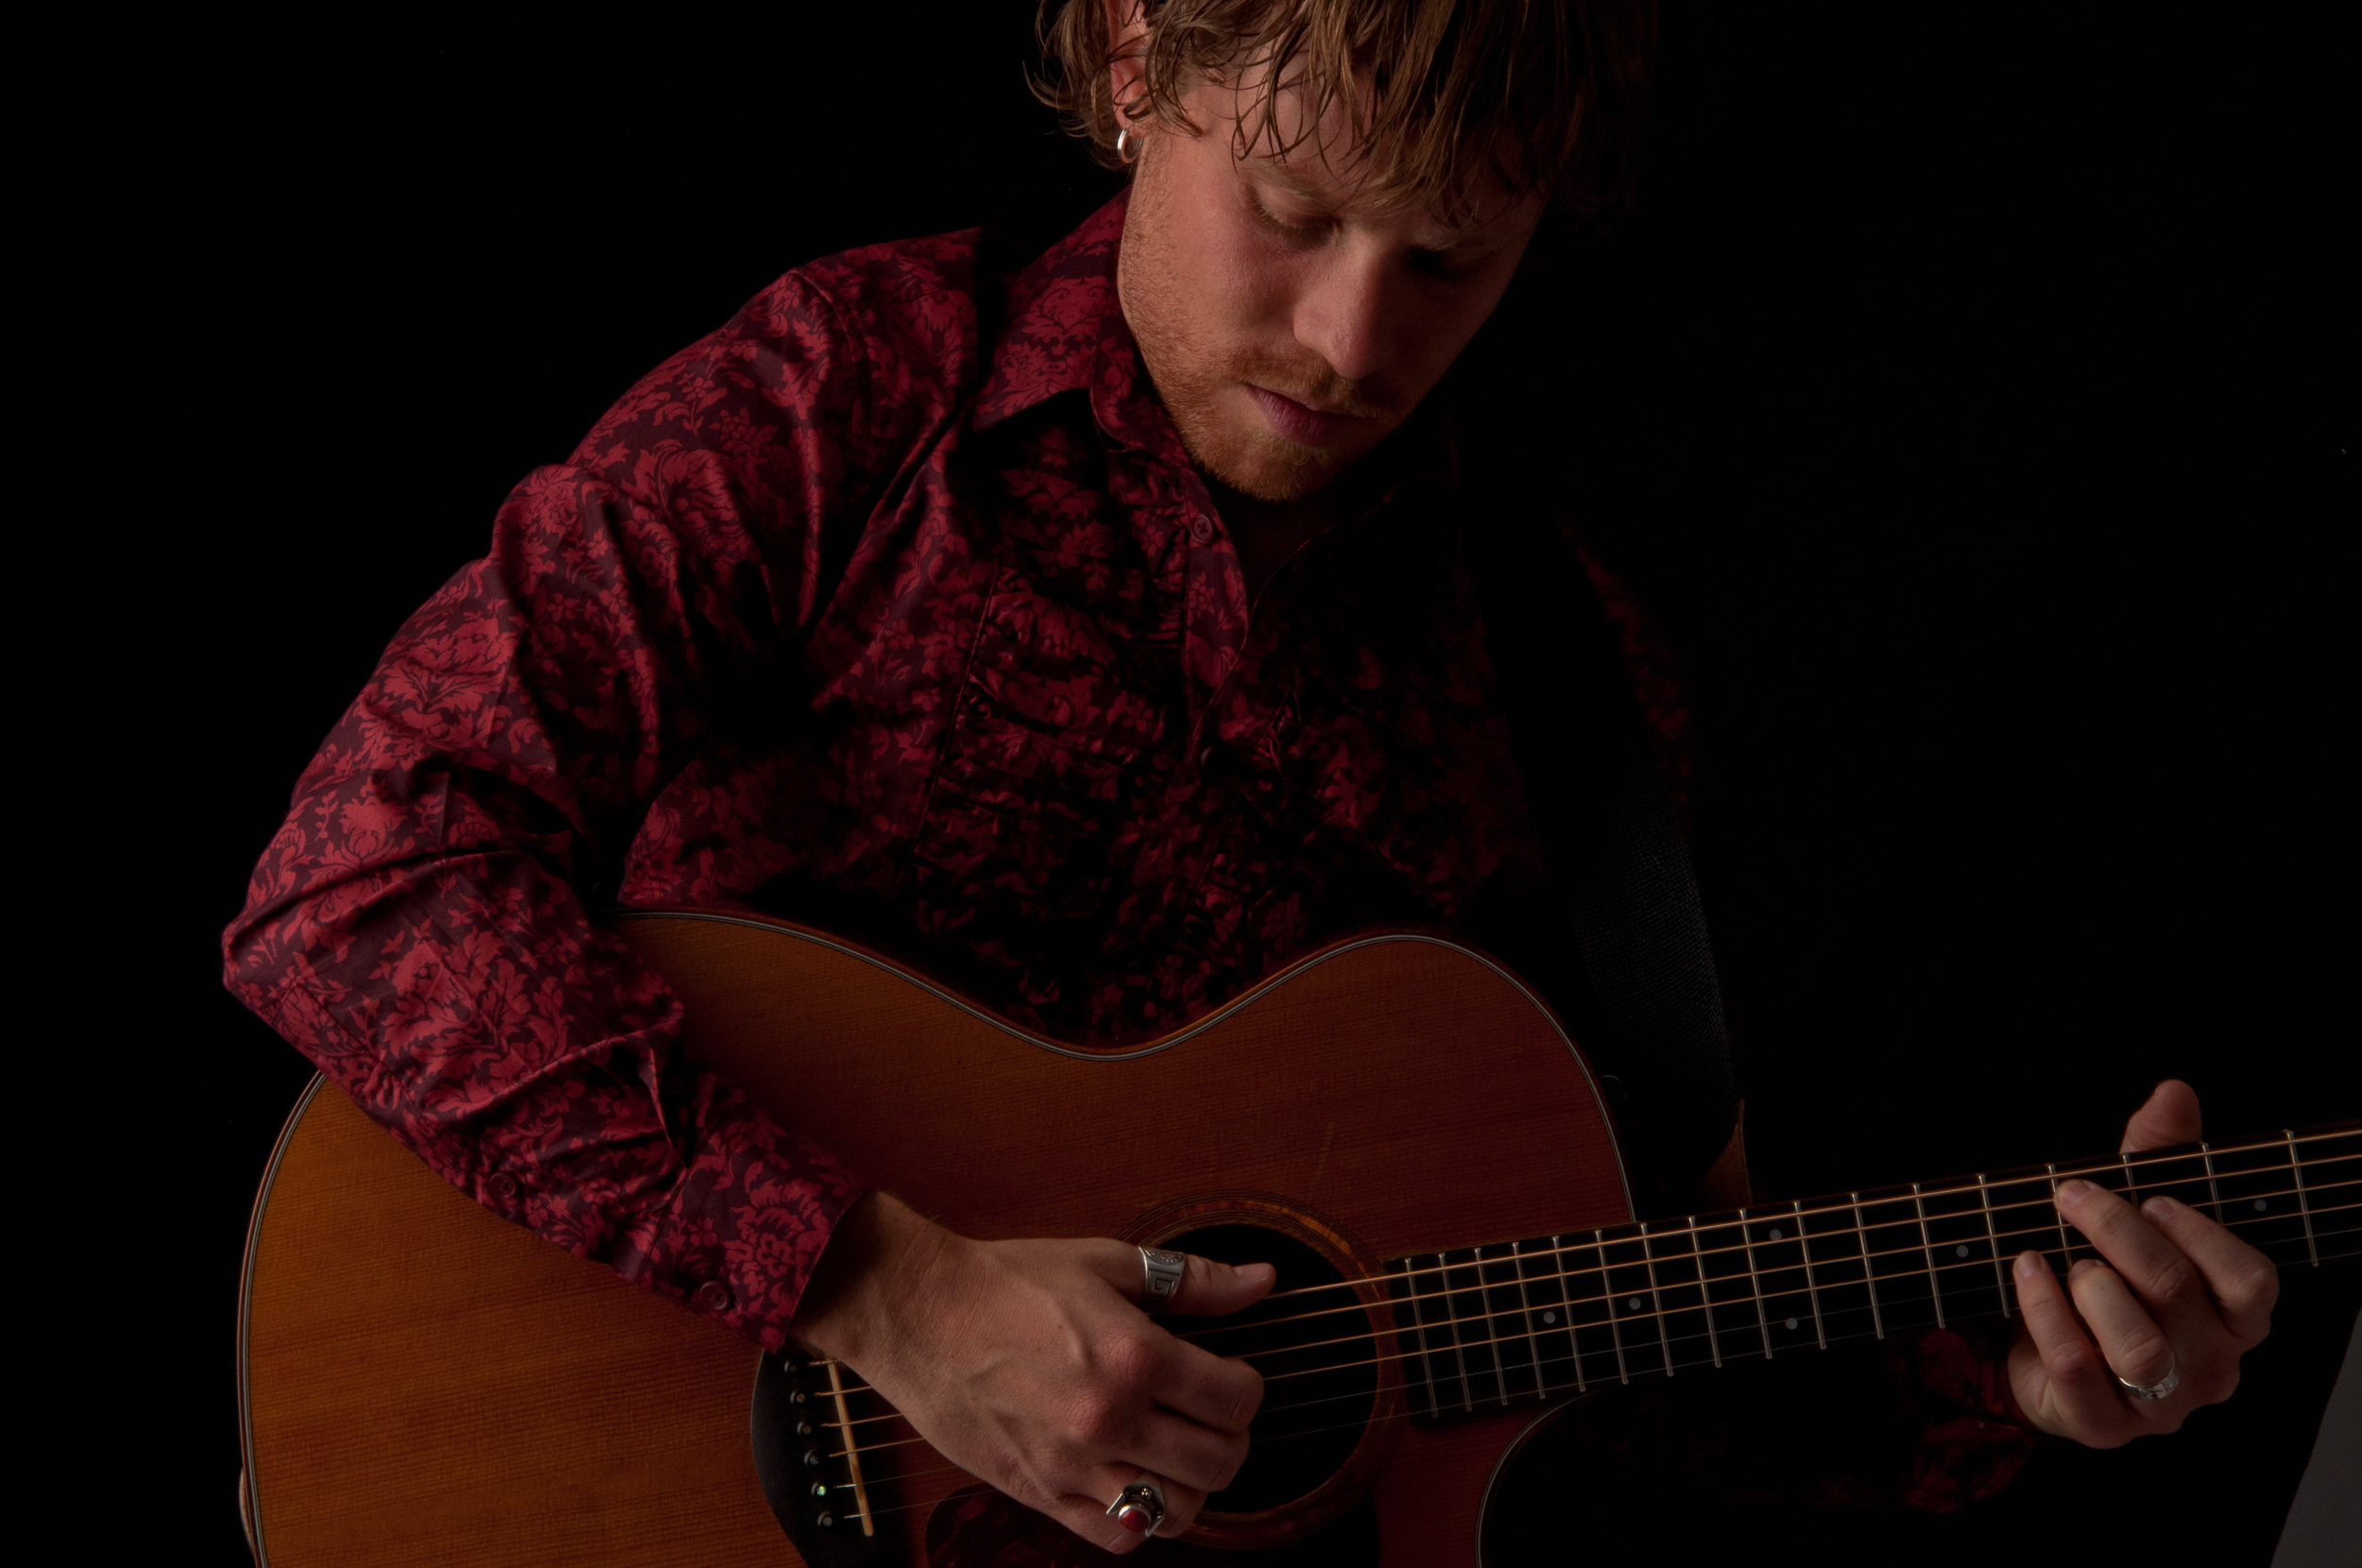 saint_george_utah_cedar_city_utah_zion_canyon_wedding_music_acoustic_singer_songwriter_wedding_ceremony9.jpg